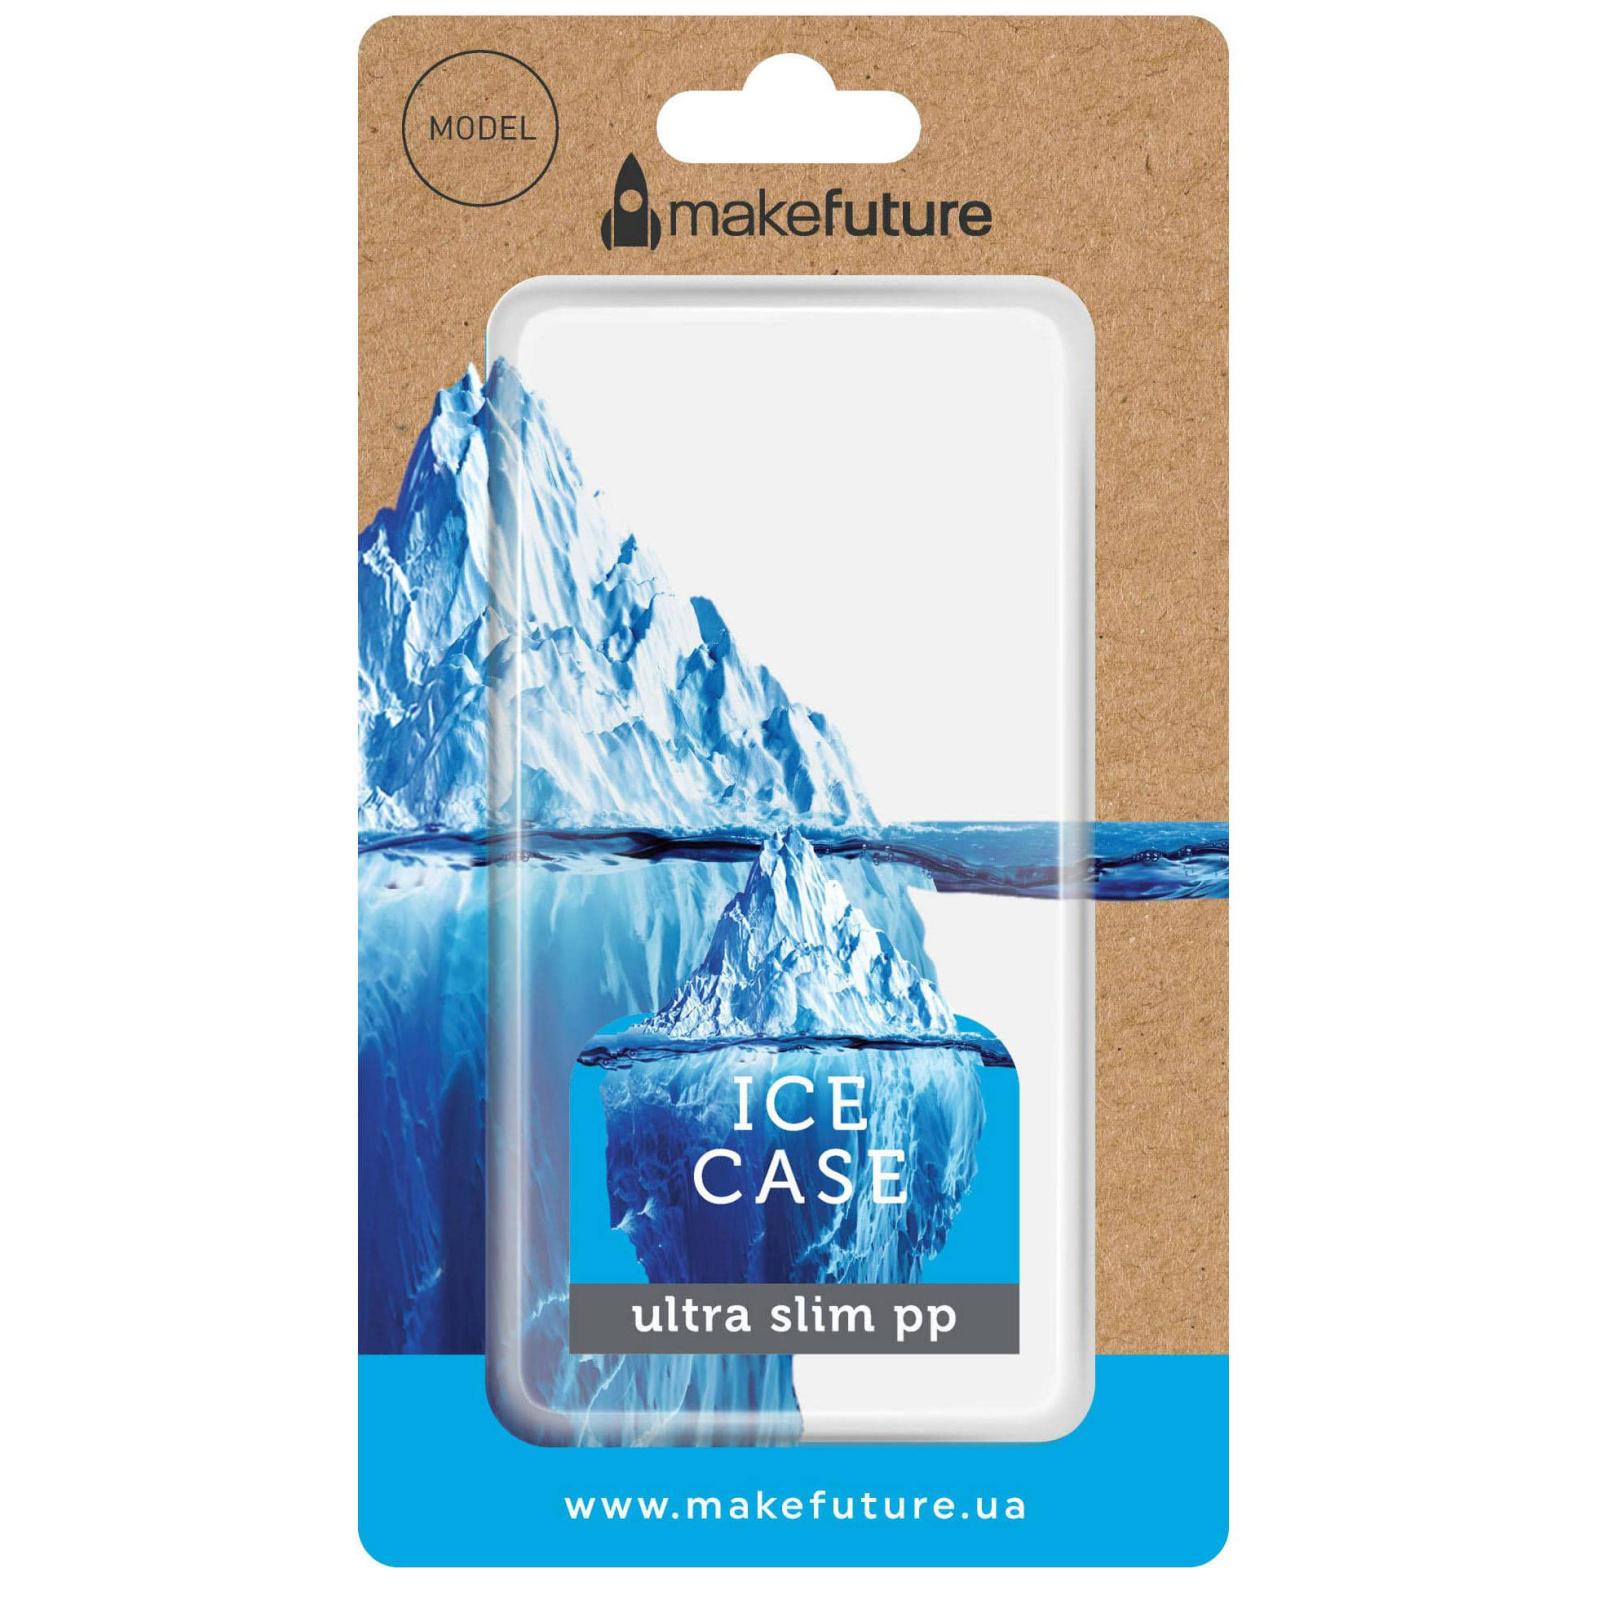 Чехол для моб. телефона MakeFuture Ice Case (PP) для Samsung S8 White (MCI-SS8WH) изображение 4